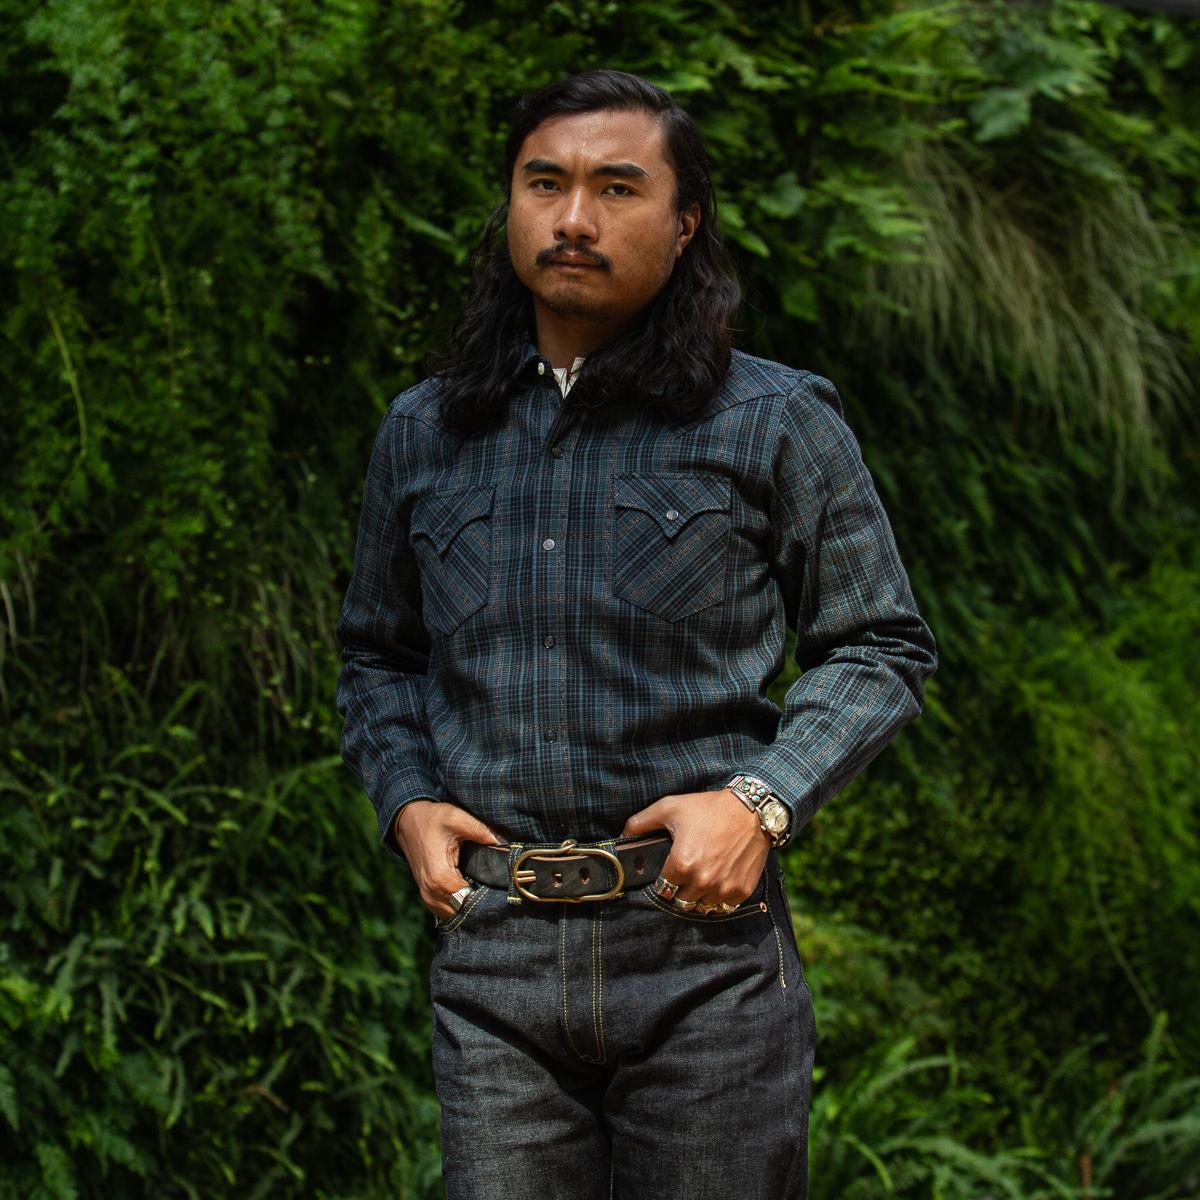 Mister Freedom - Dude Rancher Shirt - Indigo x Covert Check-Flat-16-Onbody-5760 x 3840-01.jpg